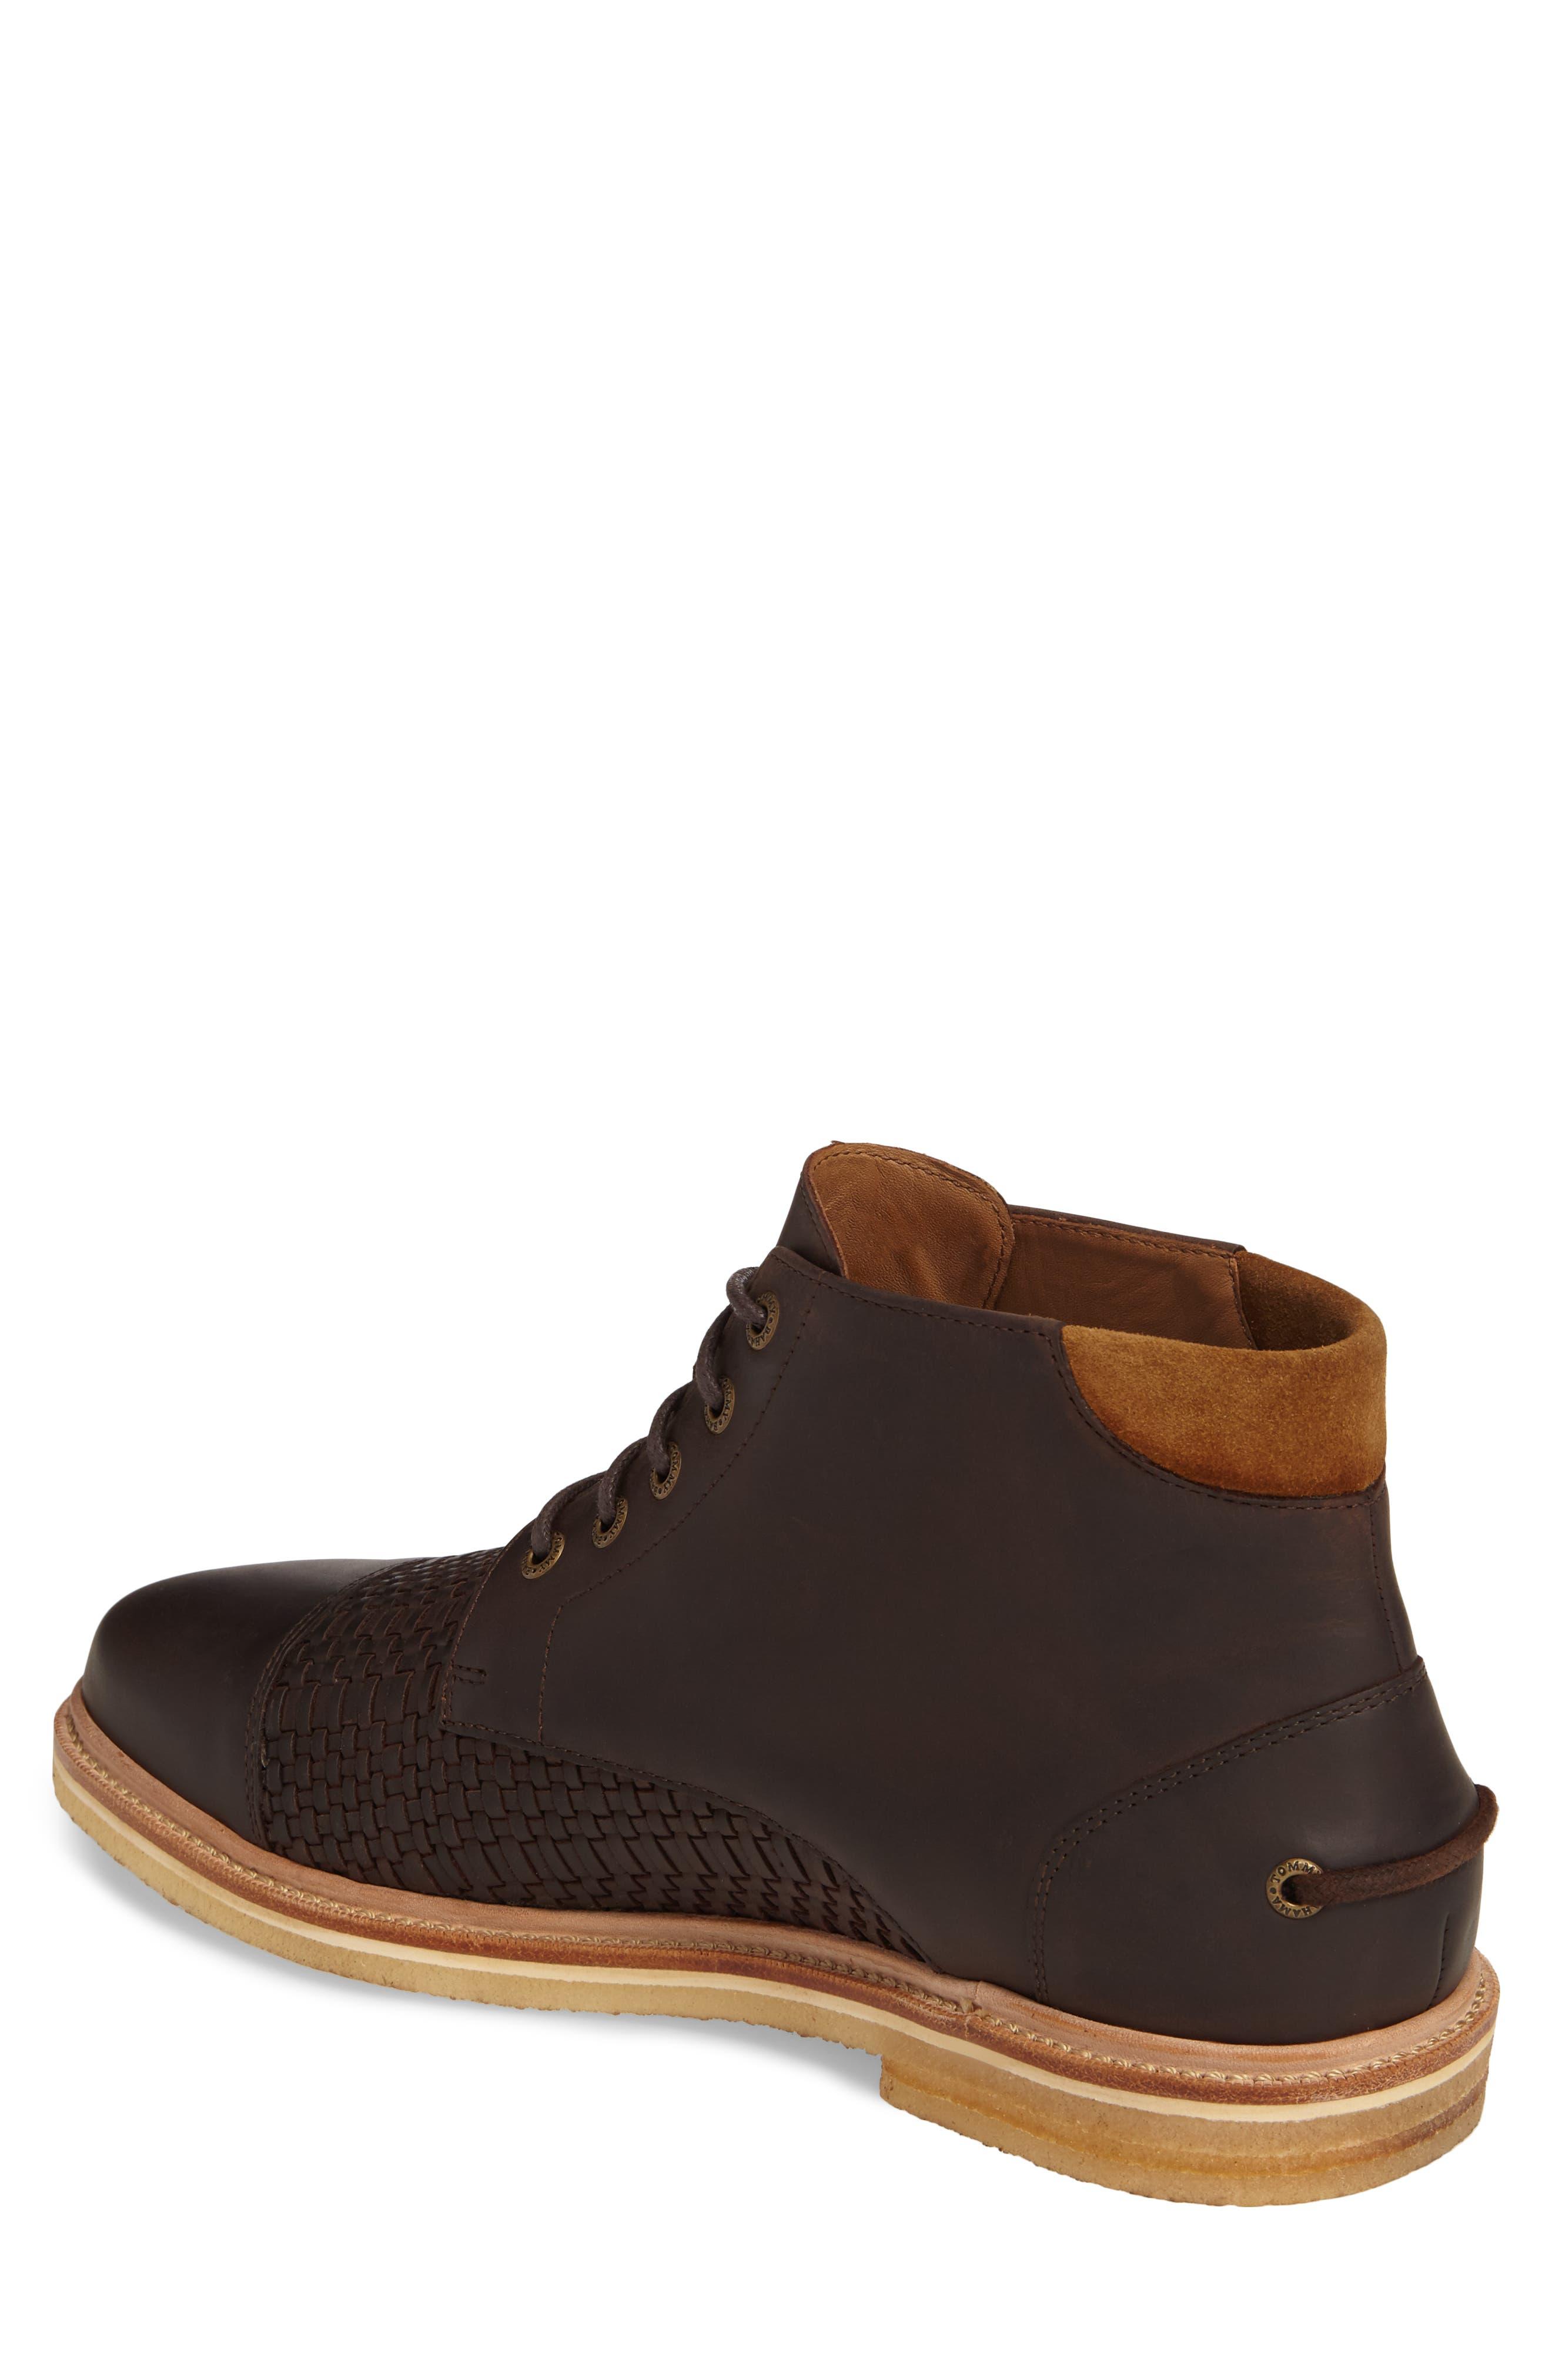 Argon Blooms Cap Toe Boot,                             Alternate thumbnail 2, color,                             Brown Leather